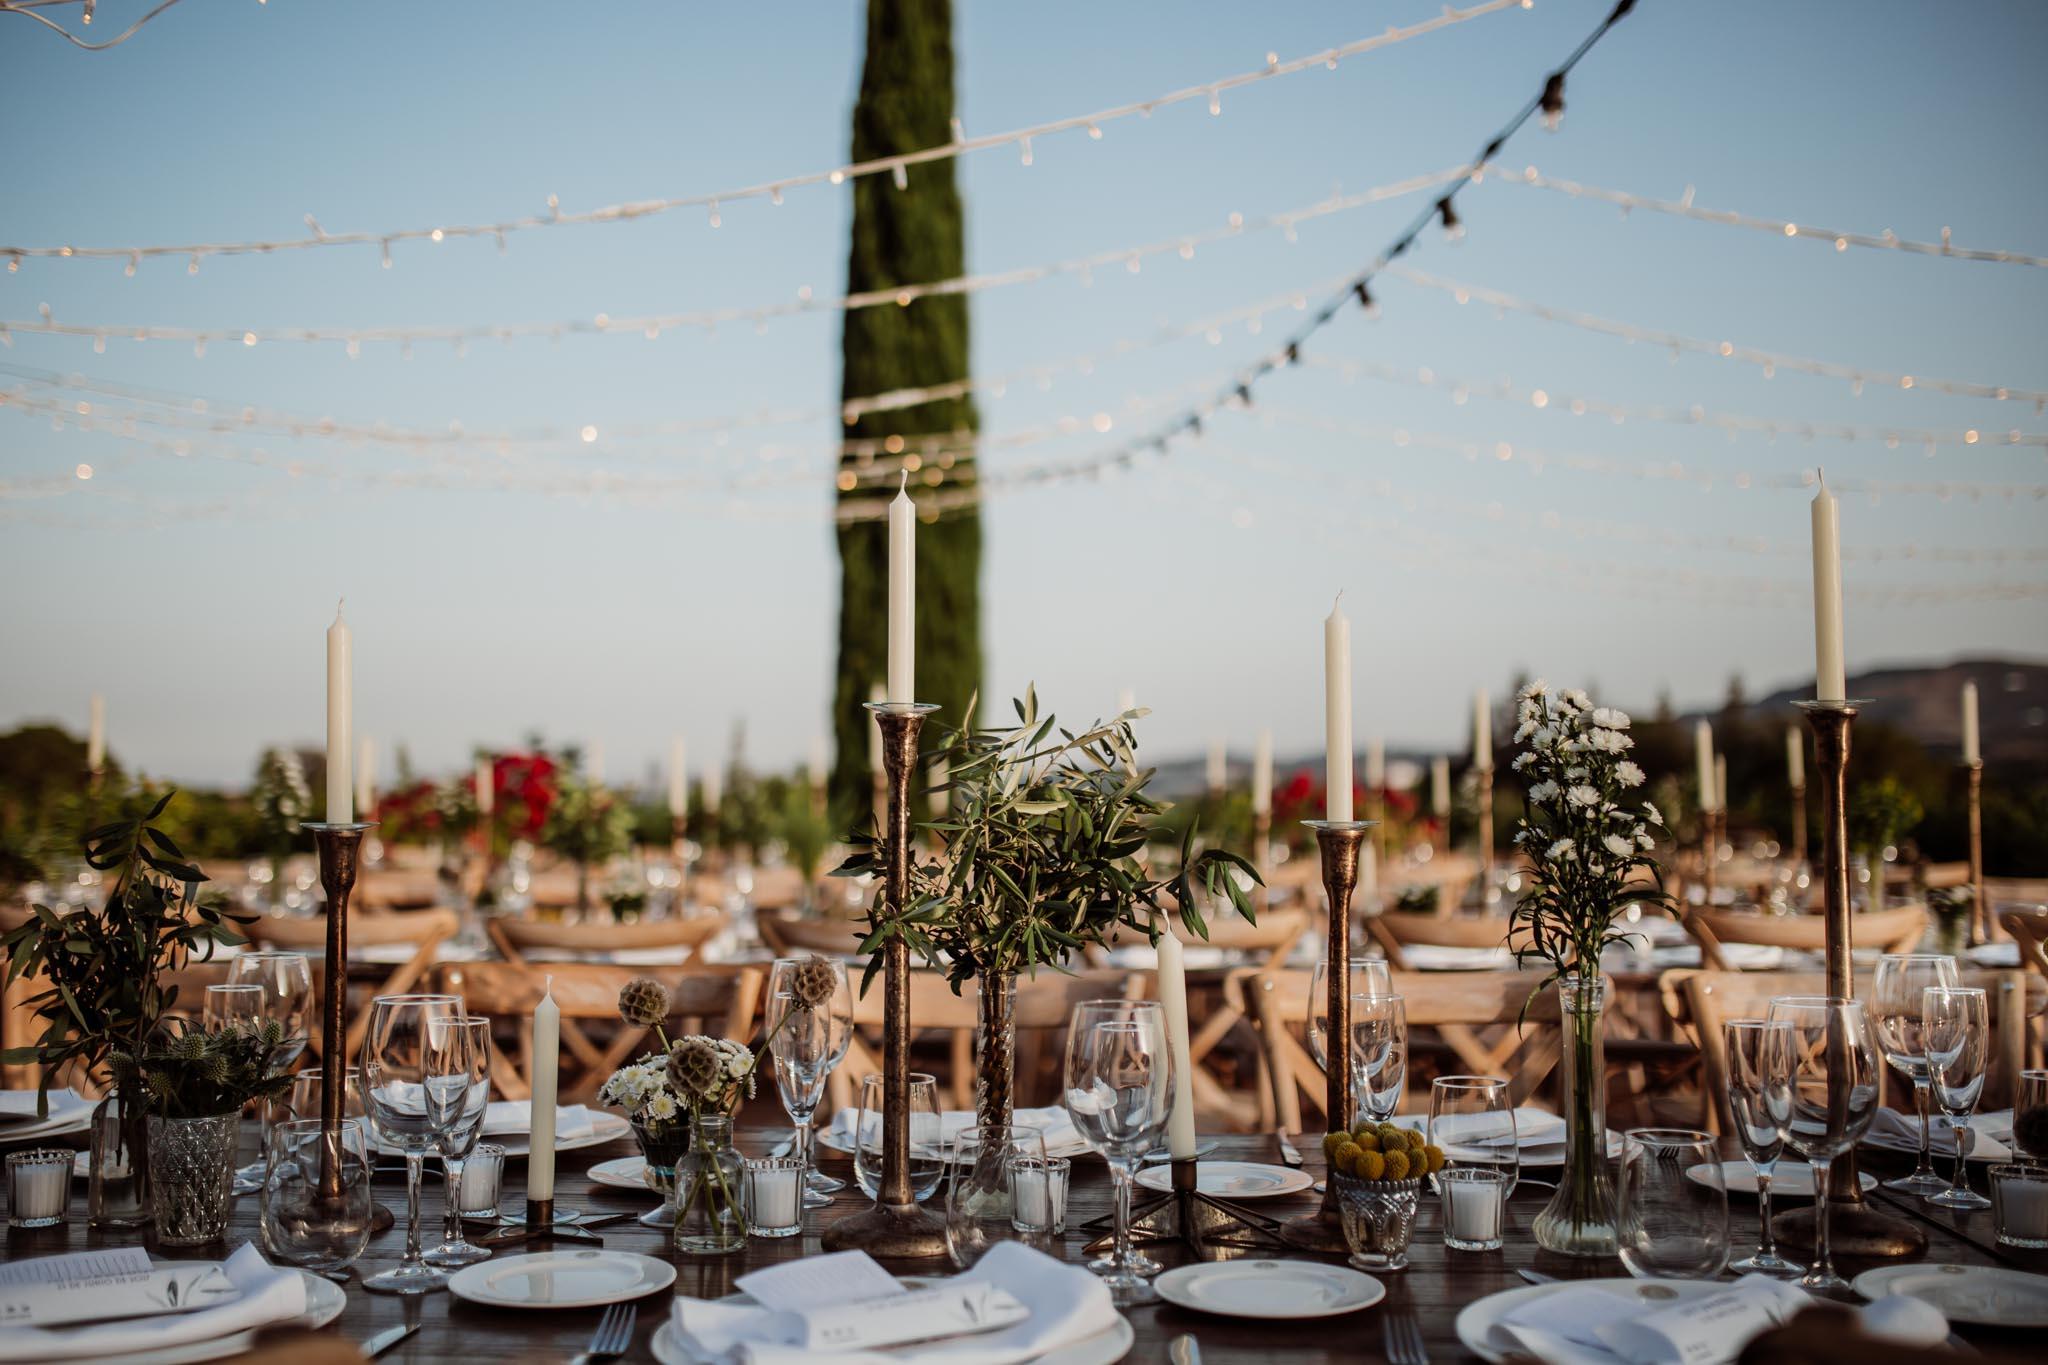 Si-Quiero-Wedding-Planner-By-Sira-Antequera-Bodas-Málaga-Marbella-Miami- Ana-Aitor-17